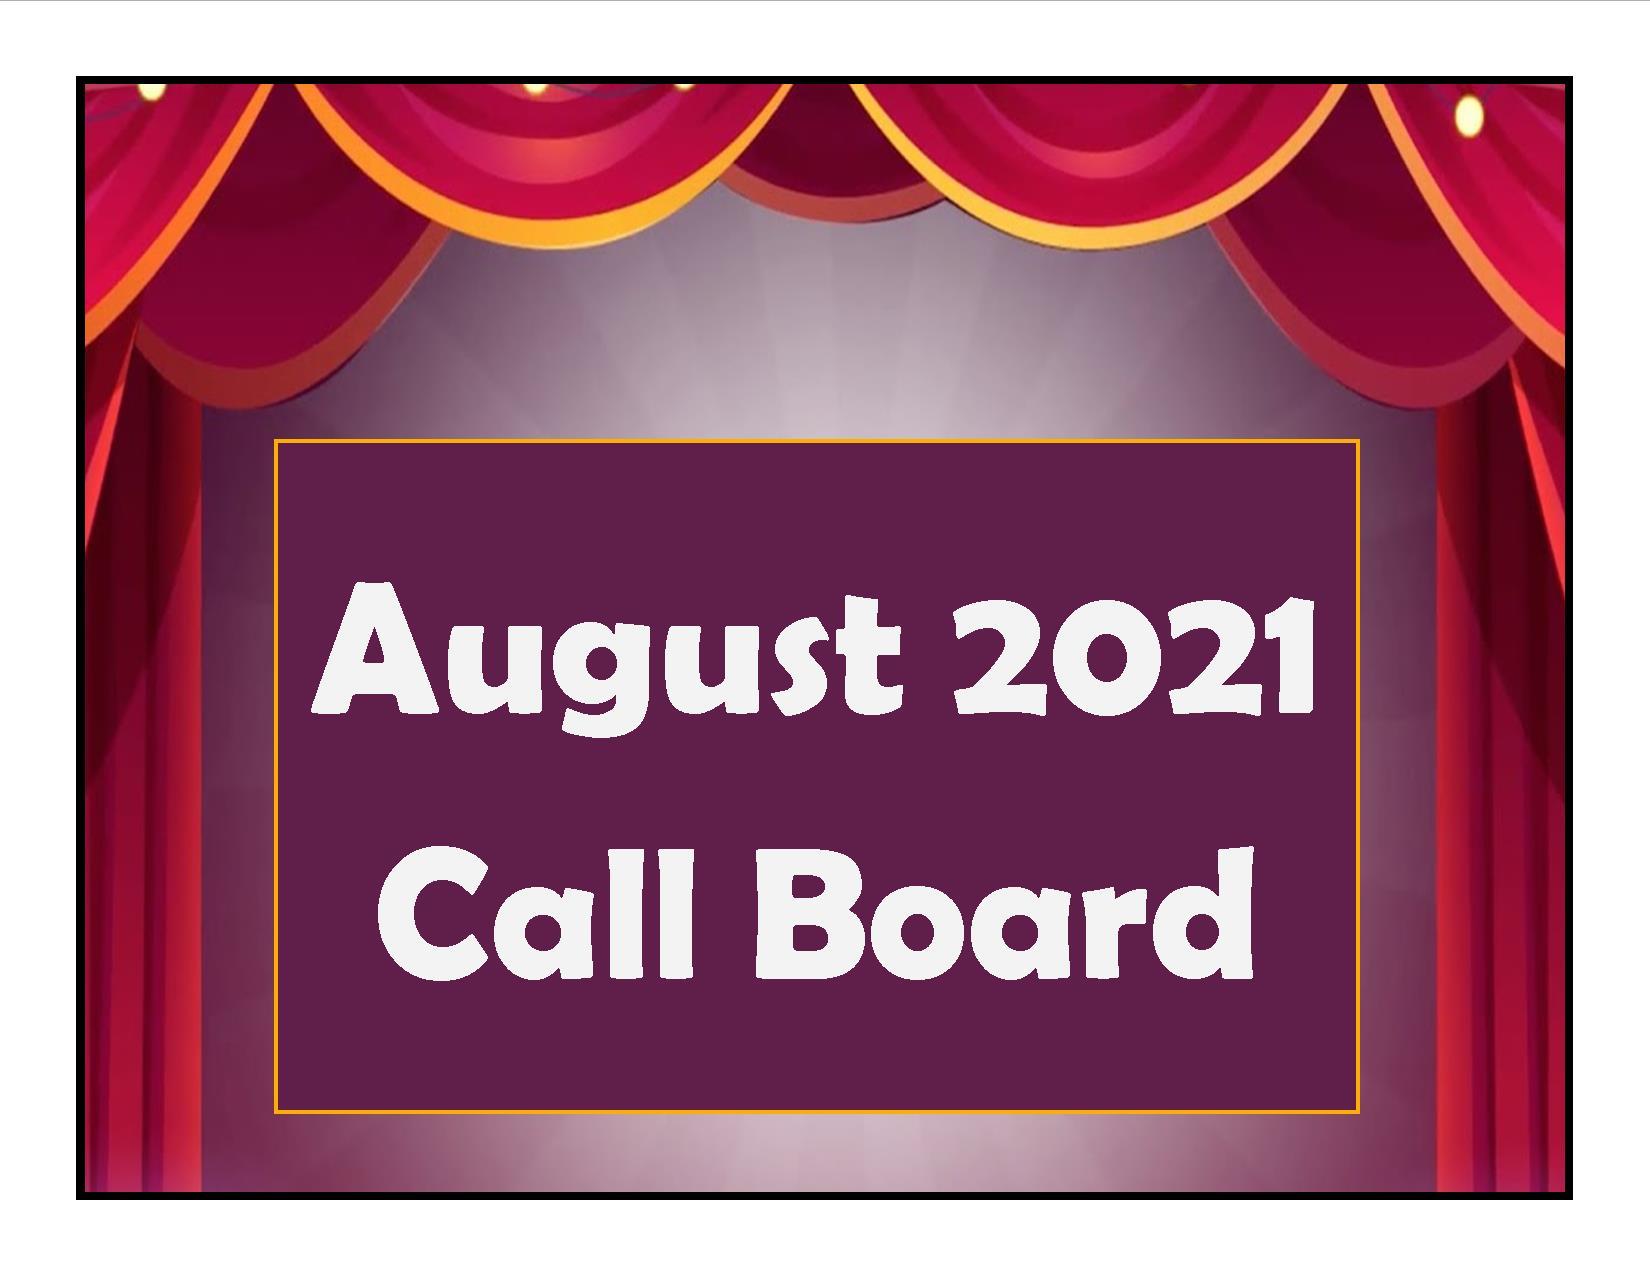 Call Board